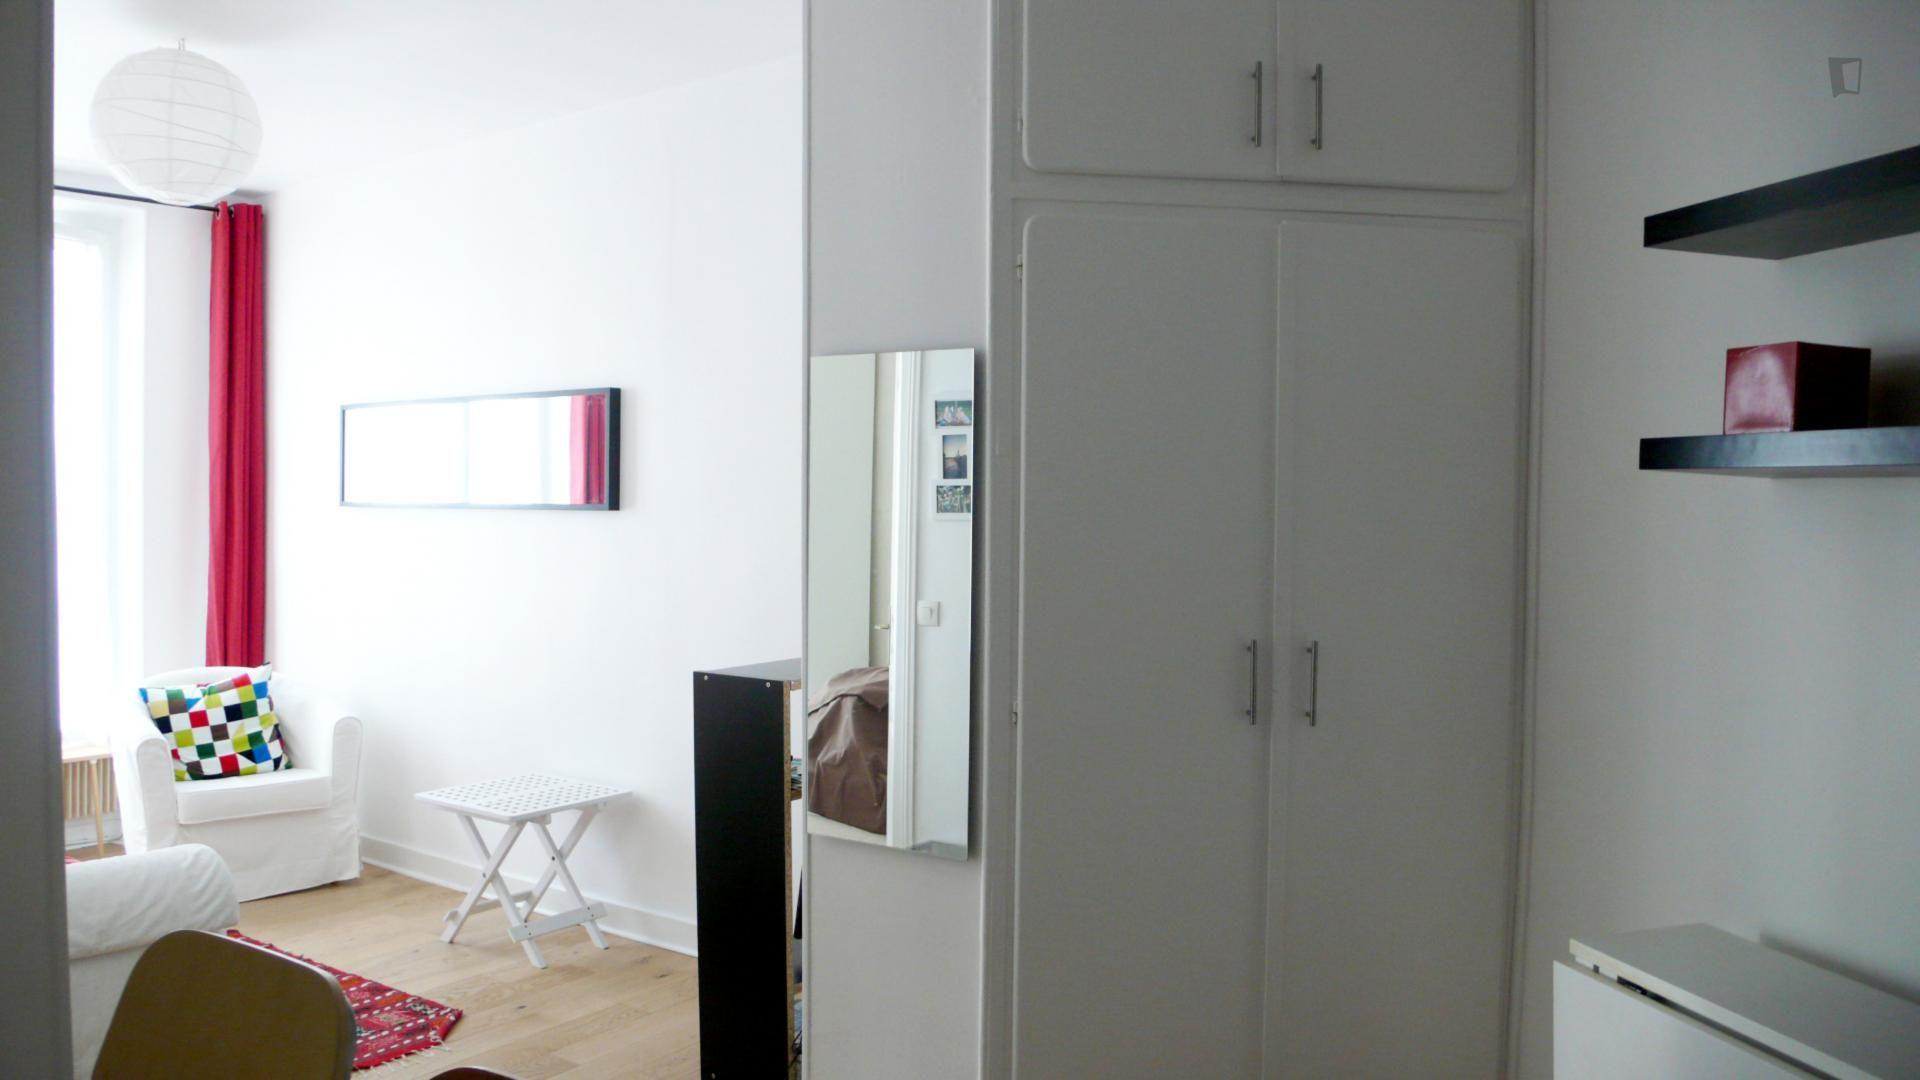 1 bed apartment at 47 Rue Letellier, 75015 Paris, France ...